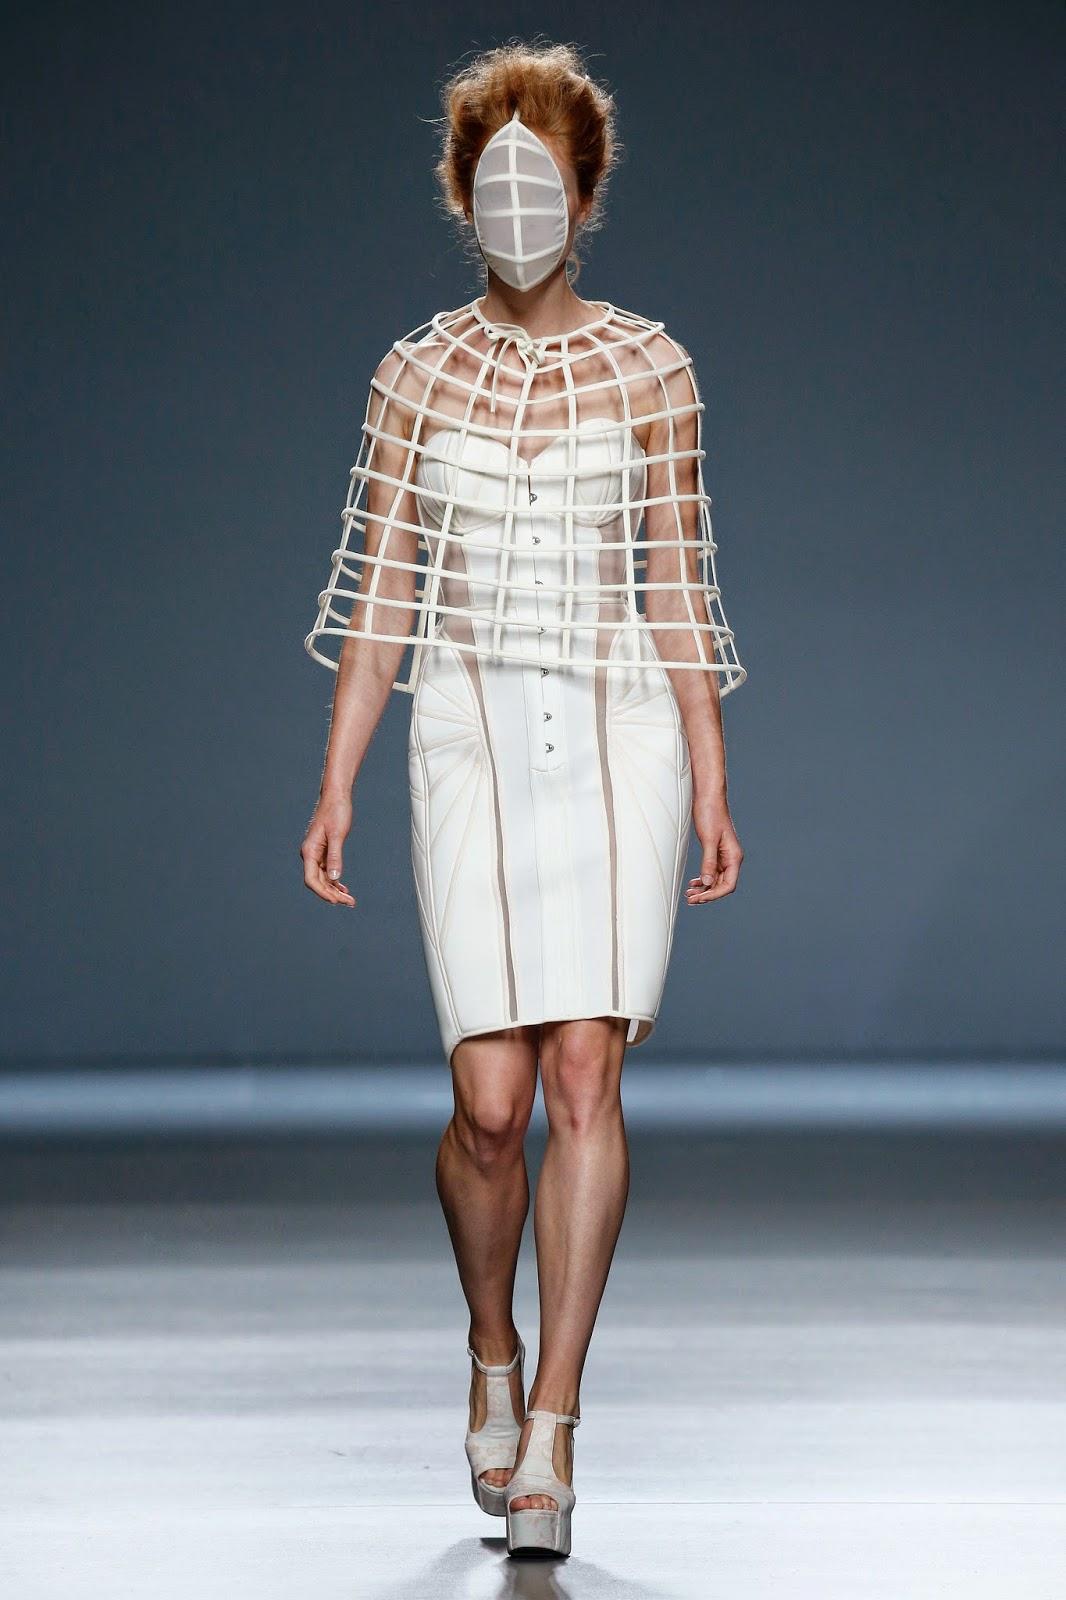 Fashion Design Inspiration Ideas- Lady Gaga Style- Fashion